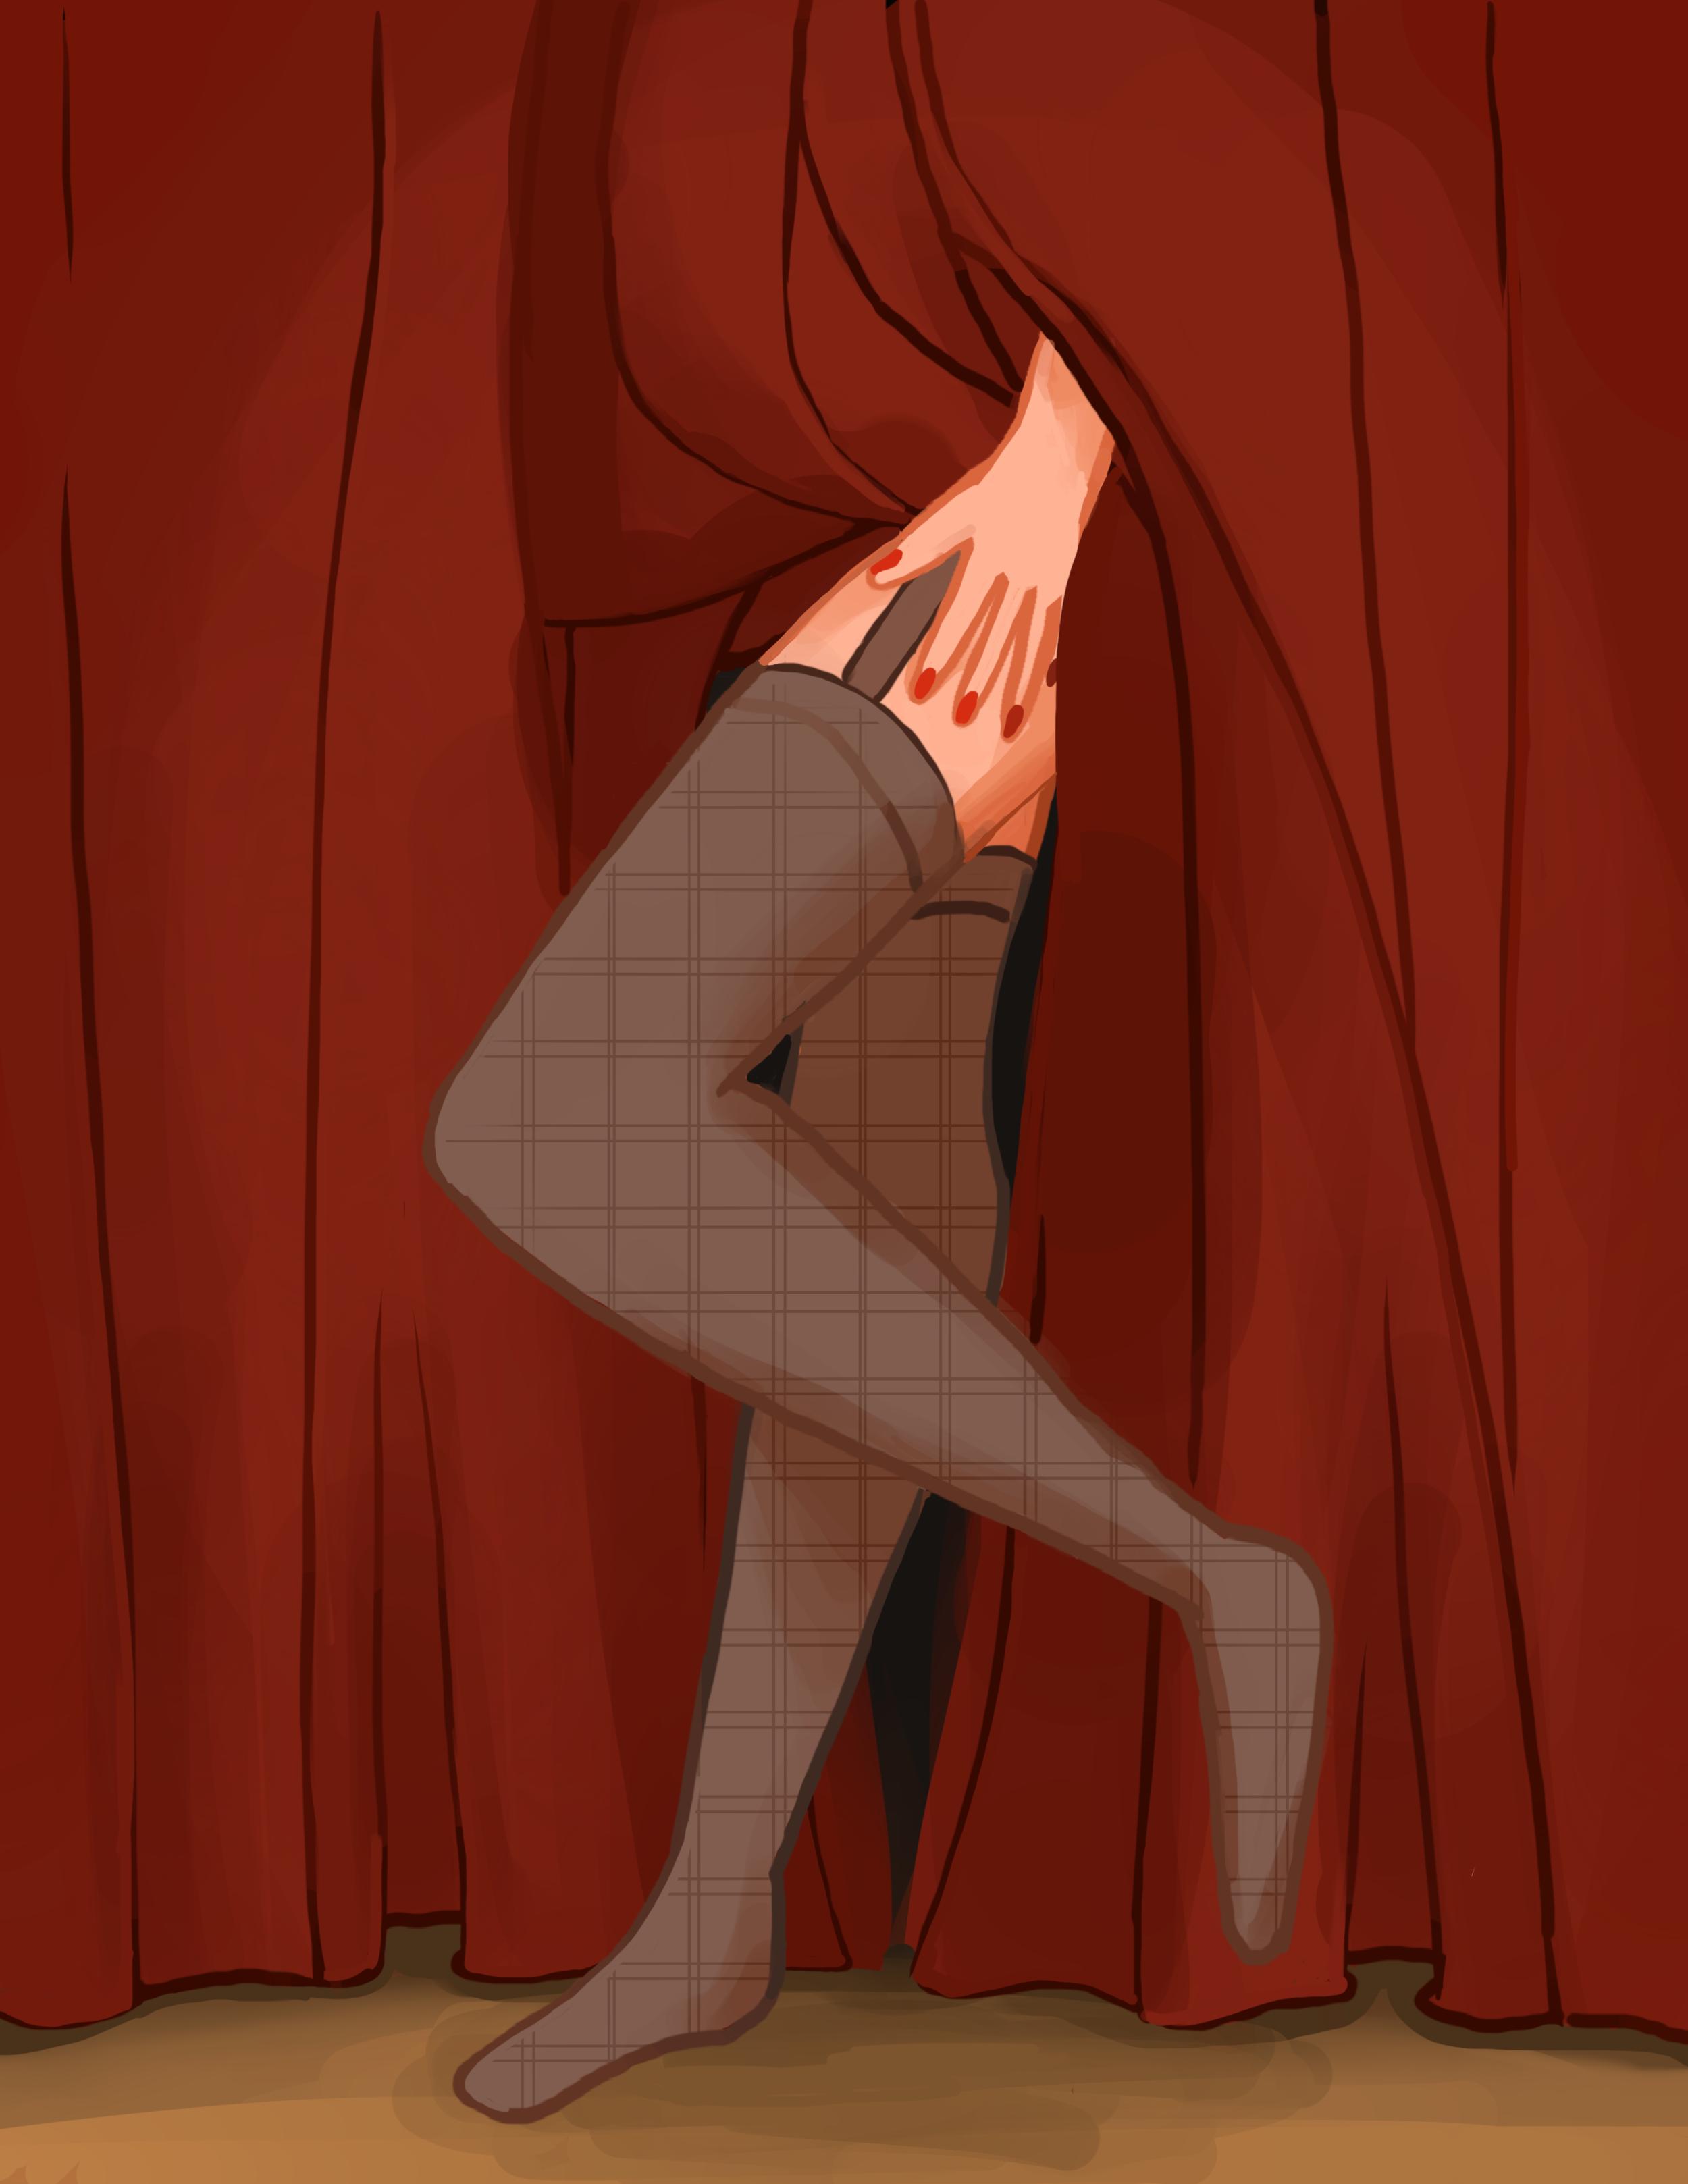 Illustration by Selena Philaphandeth